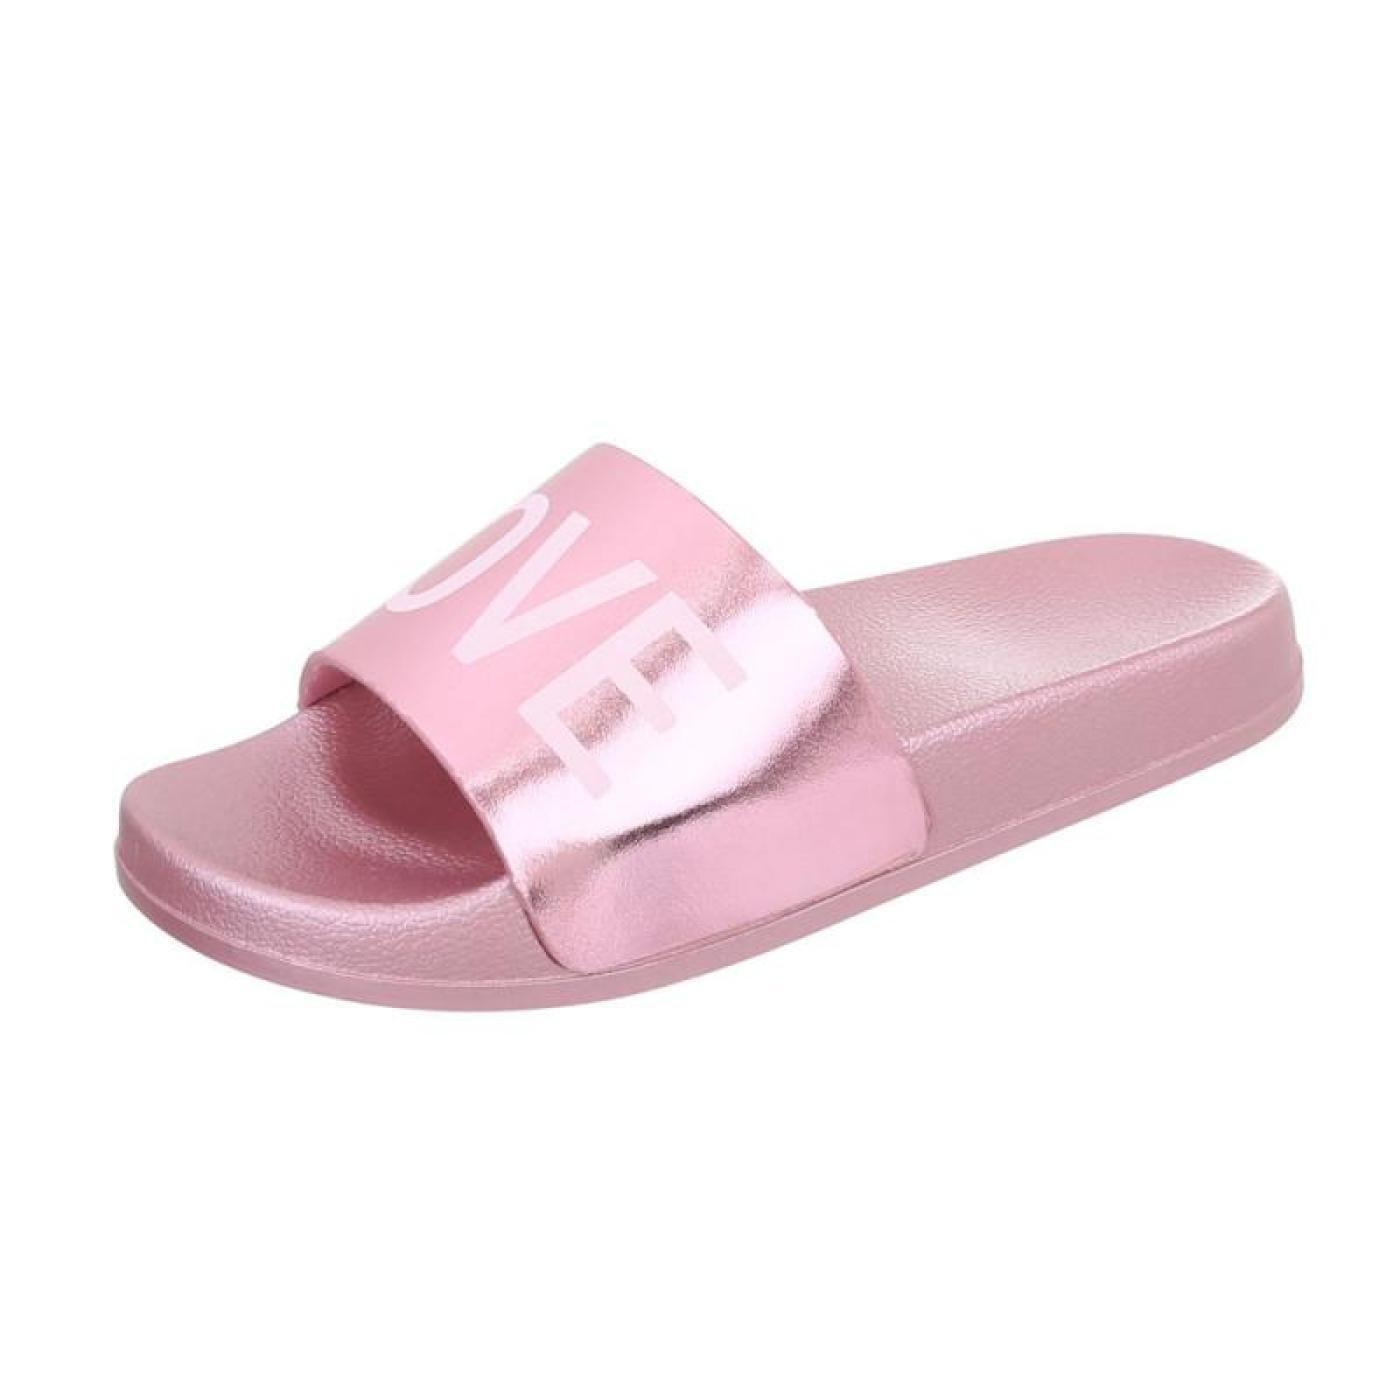 Cingant Woman Damen Latschen/Flache Sohle/Sommerschuhe/Bequeme Freizeitschuhe/Sandale/Pink/Rosa